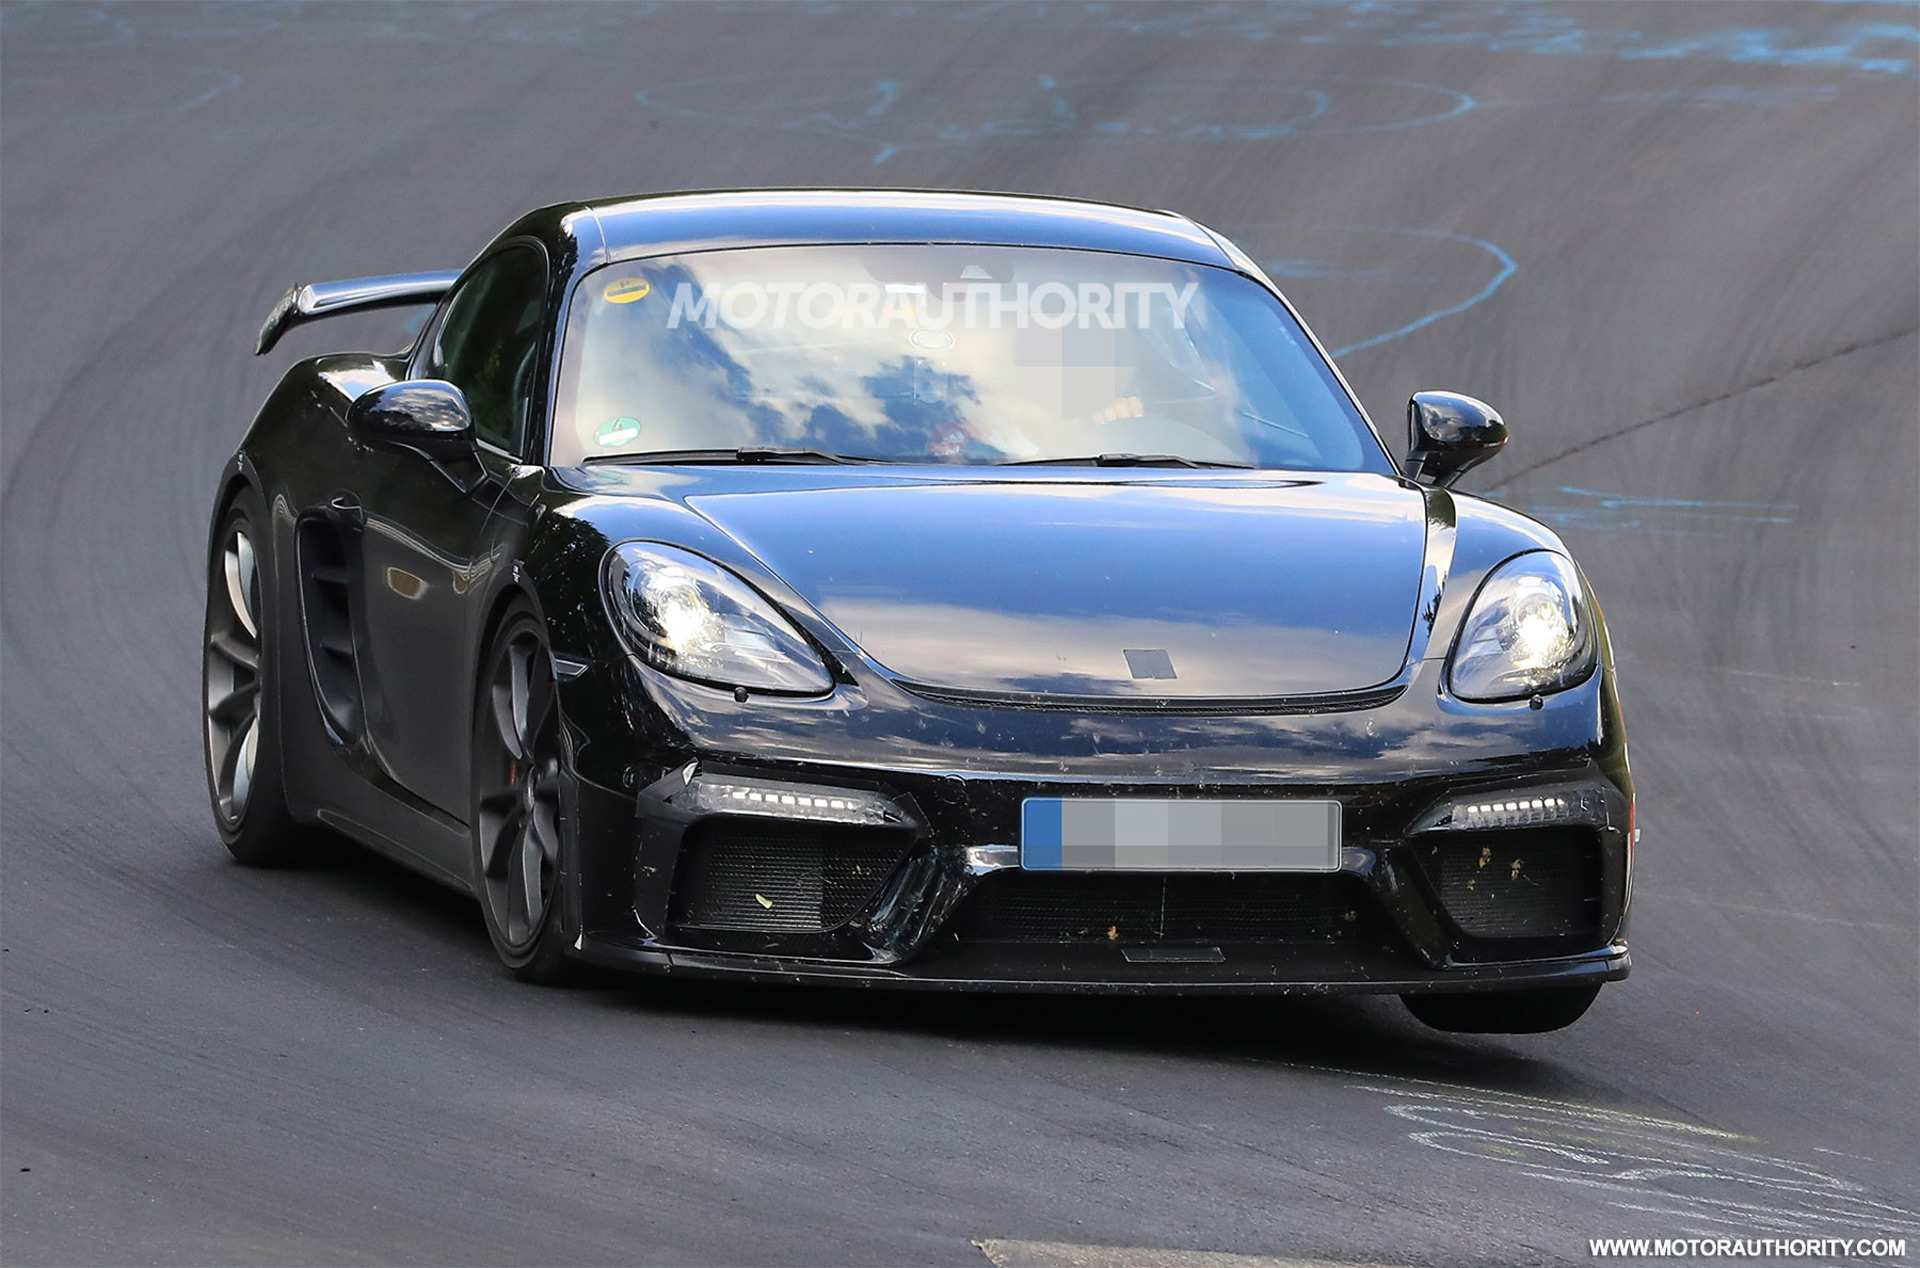 62 Best Review 2020 Porsche Gt4 Picture by 2020 Porsche Gt4